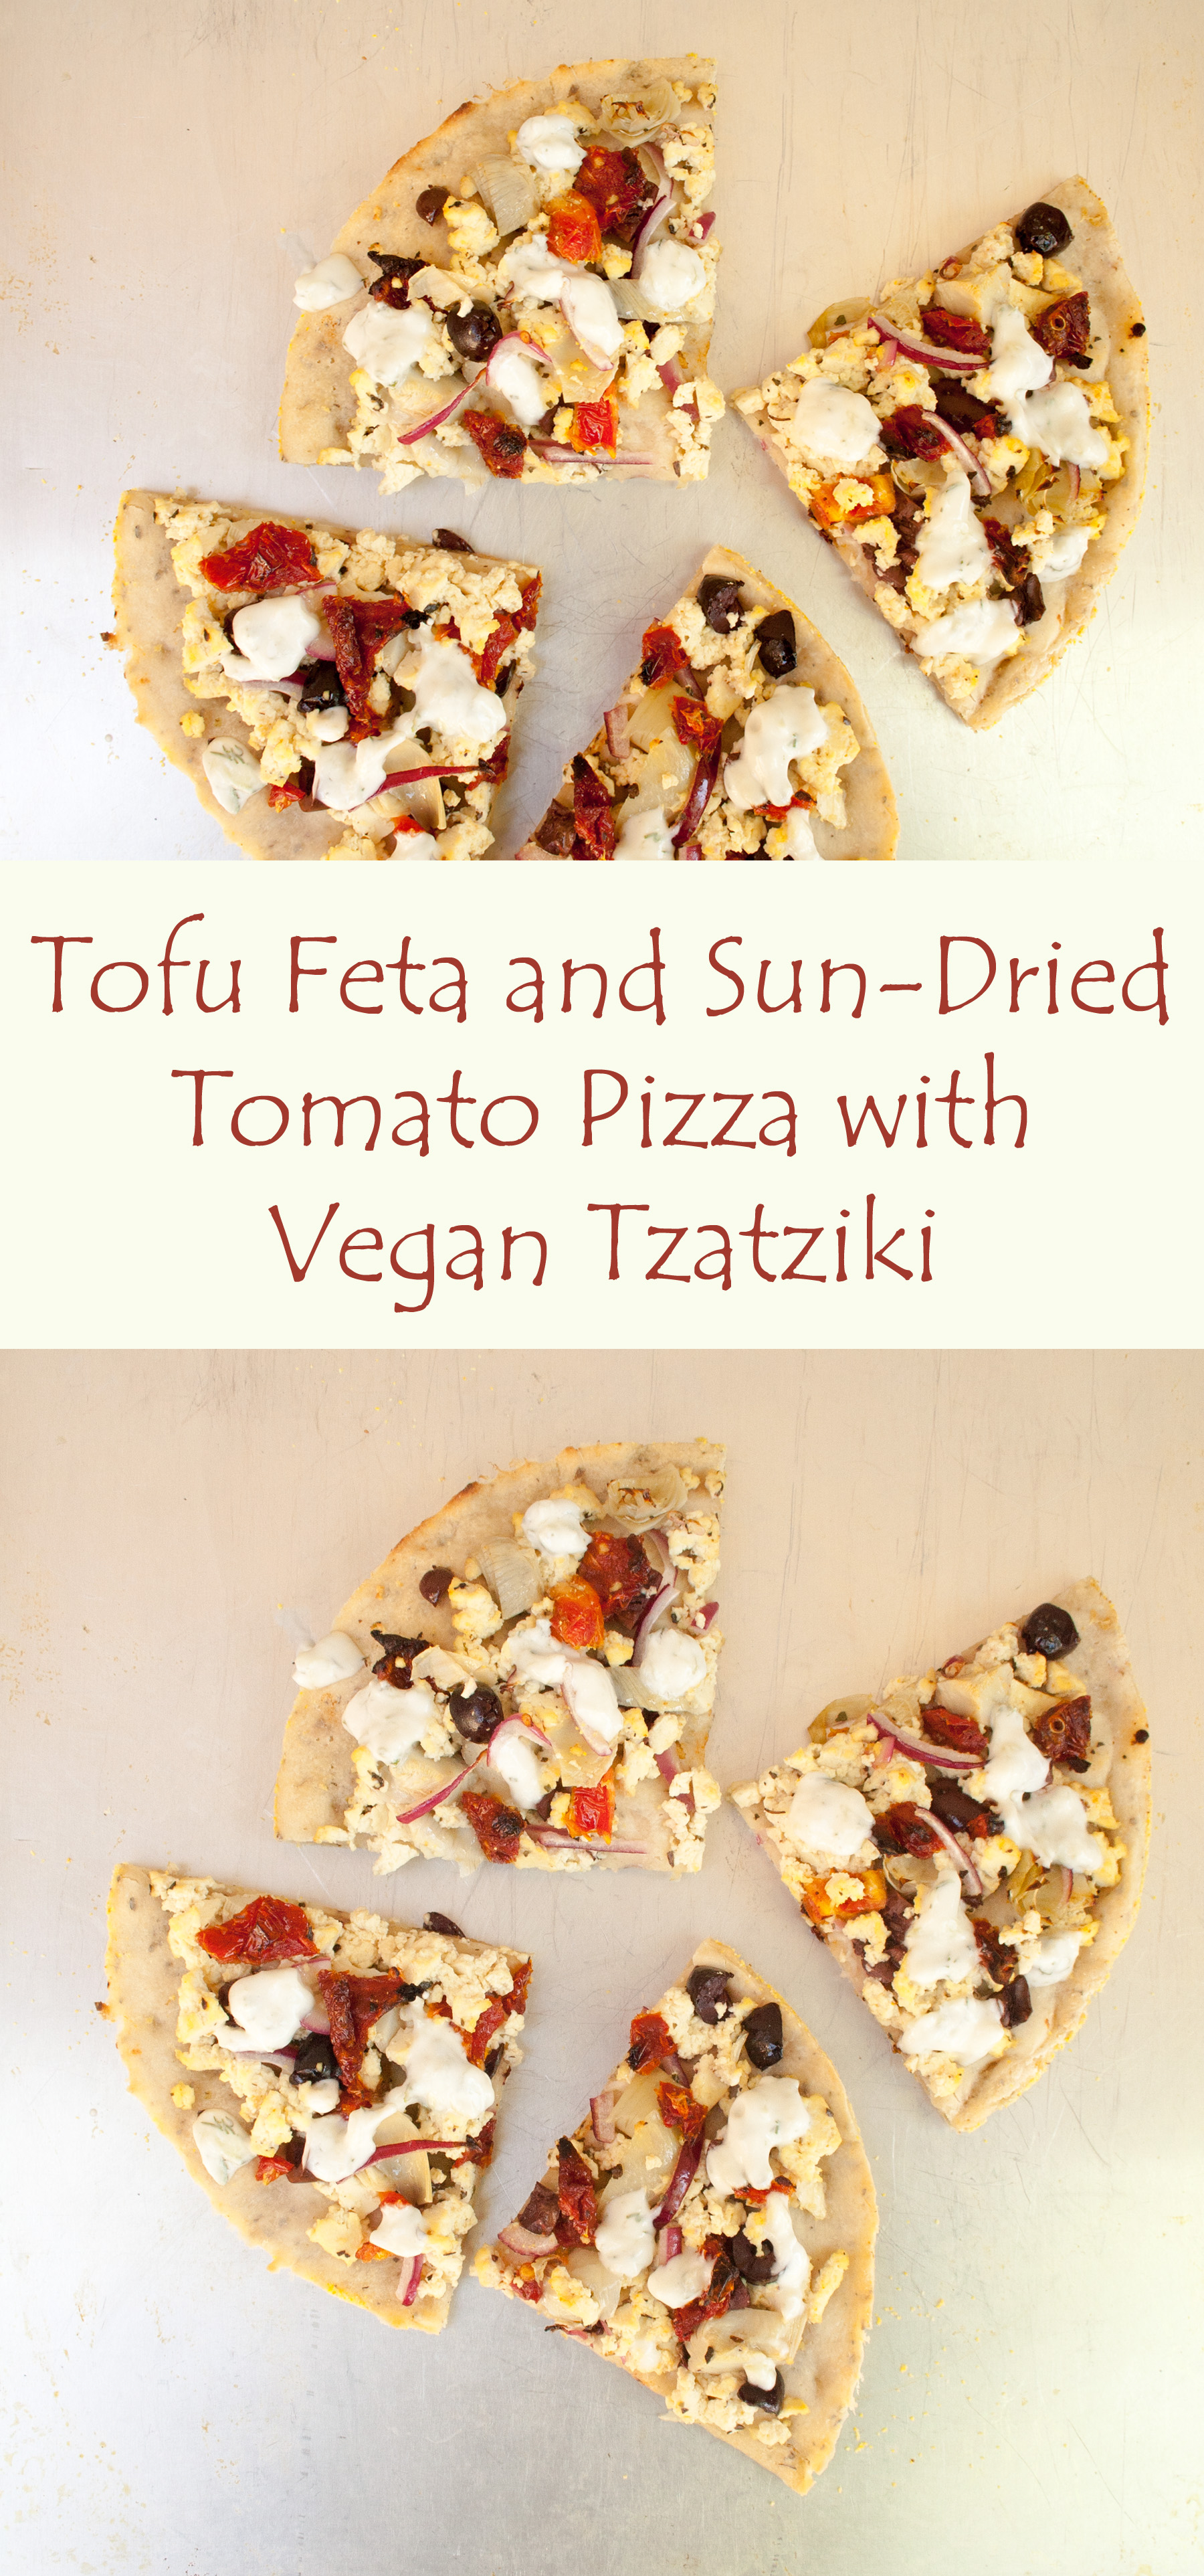 Tofu Feta and Sun-Dried Tomato Pizza with Vegan Tzatziki collage photo with text.